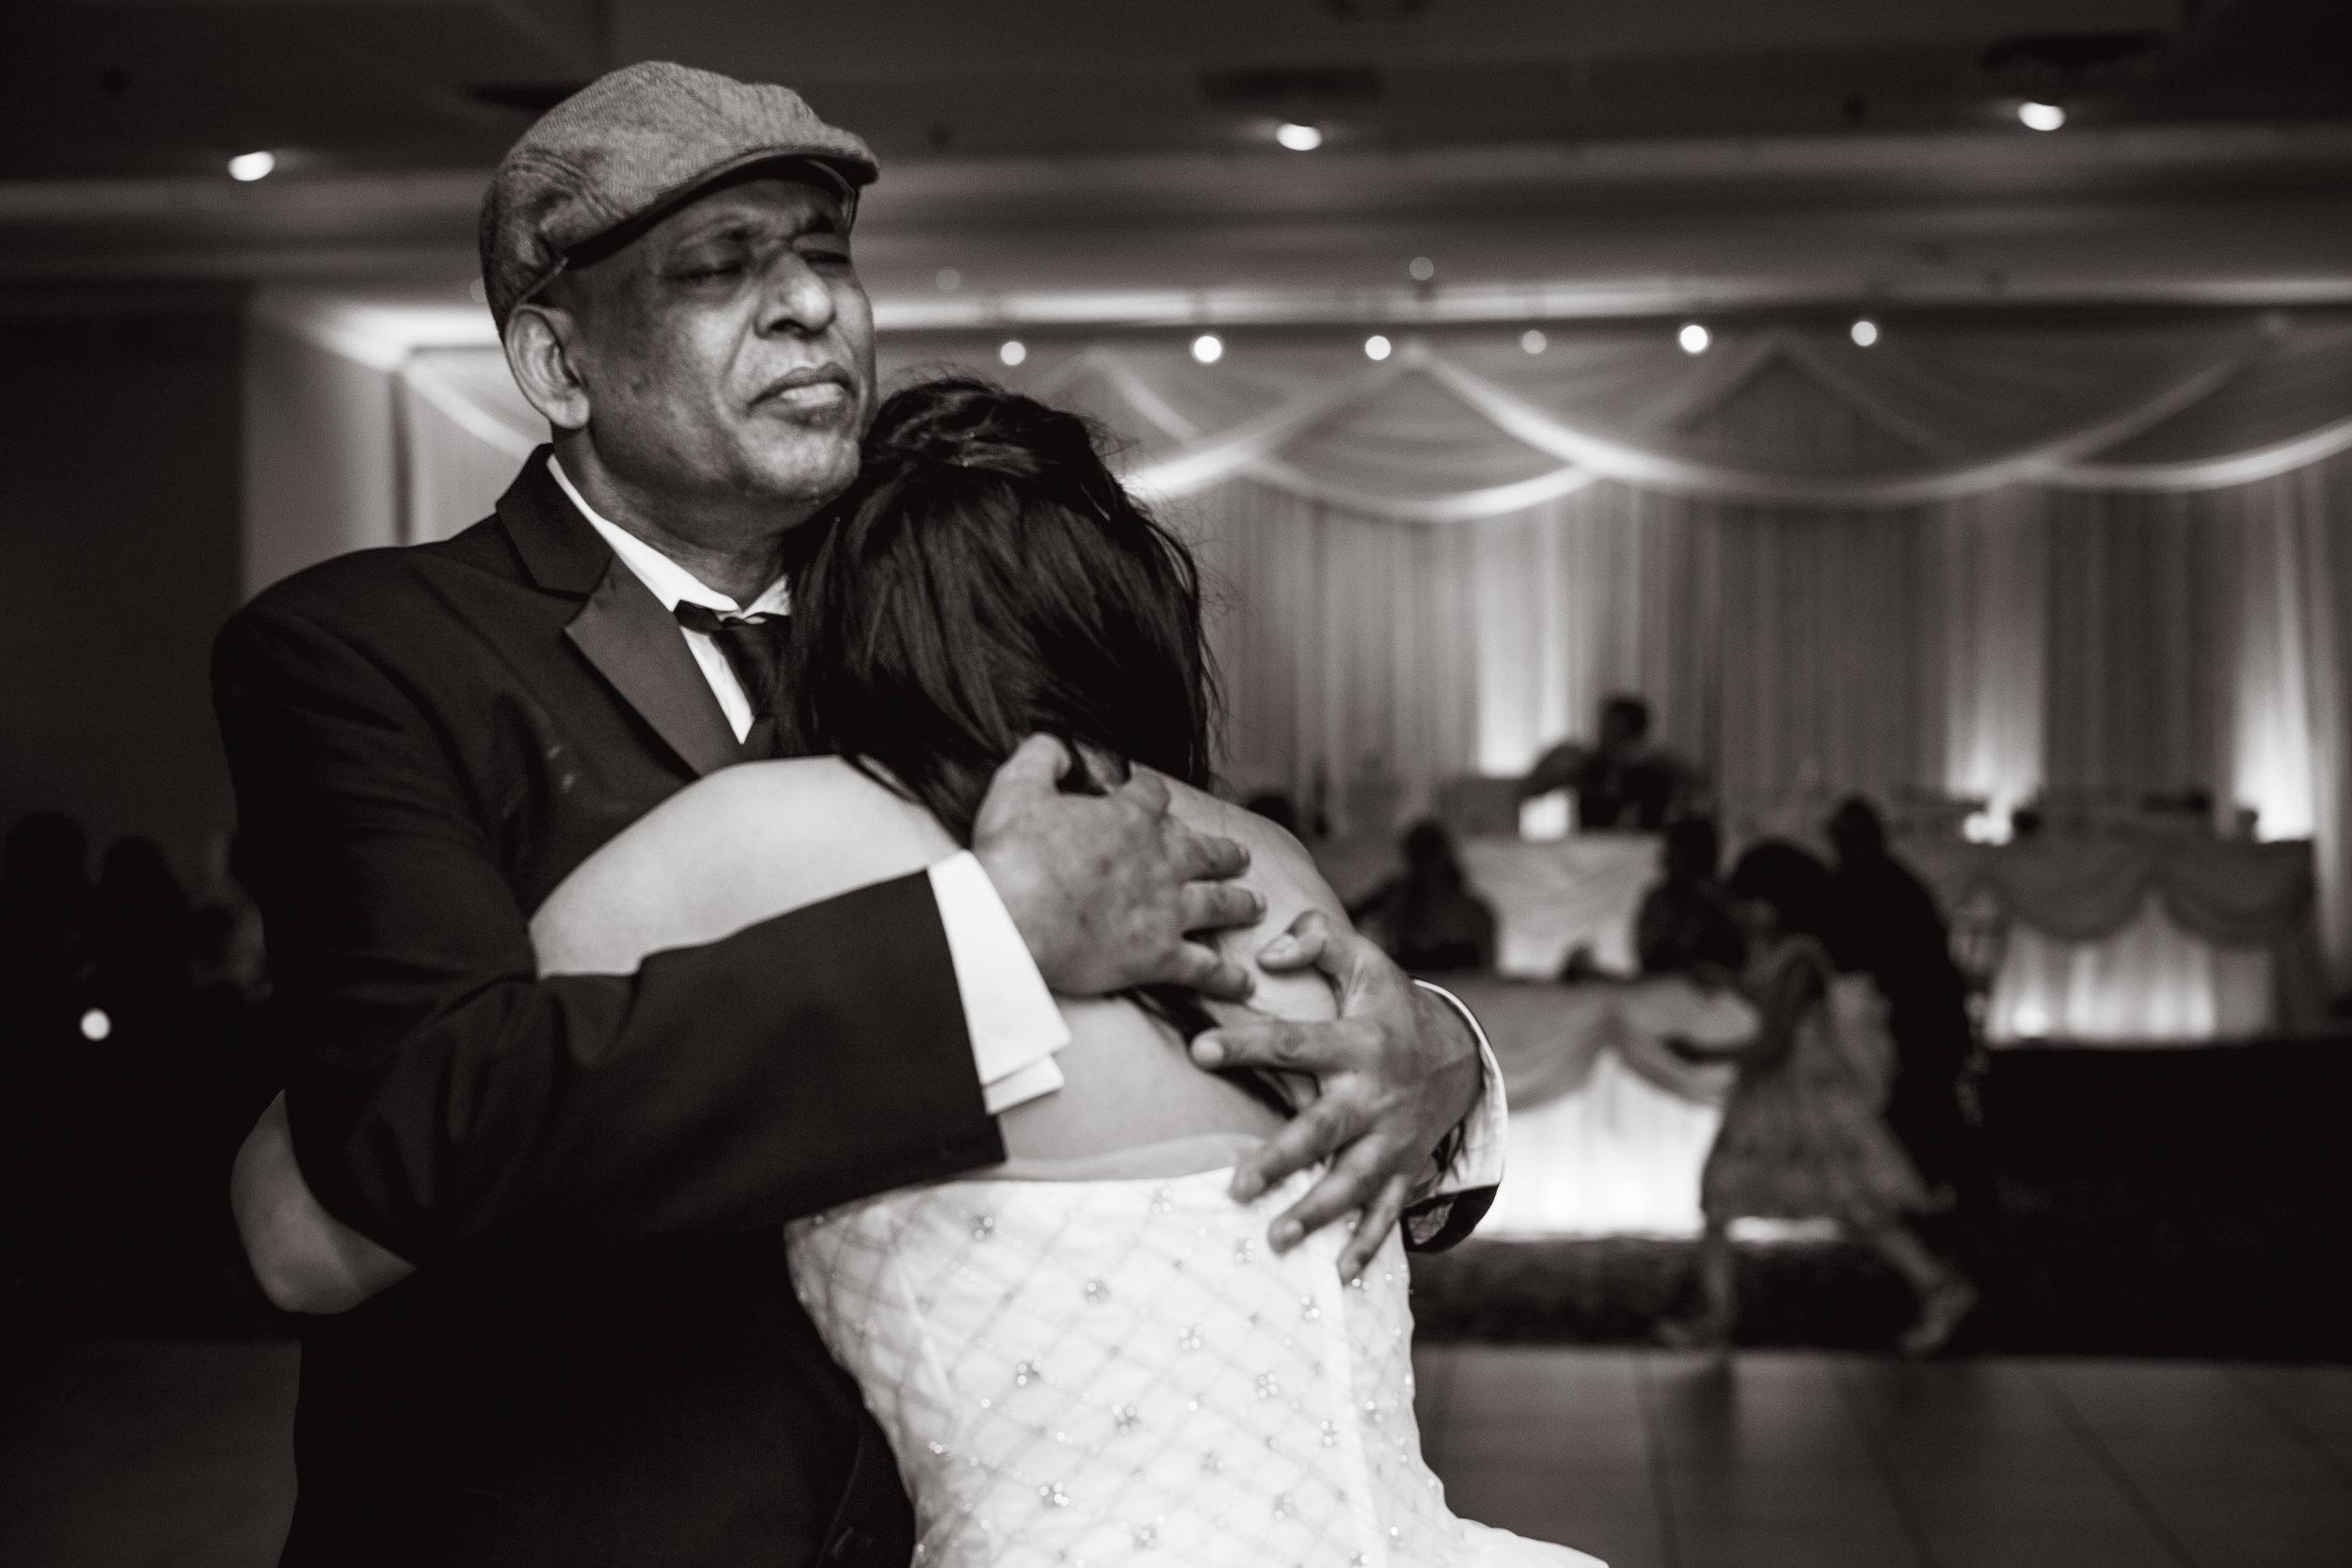 JVaughnPhotography-wedding-Huntley-Photographer-Chicago-Barringon-NW_Suberbs.jpg